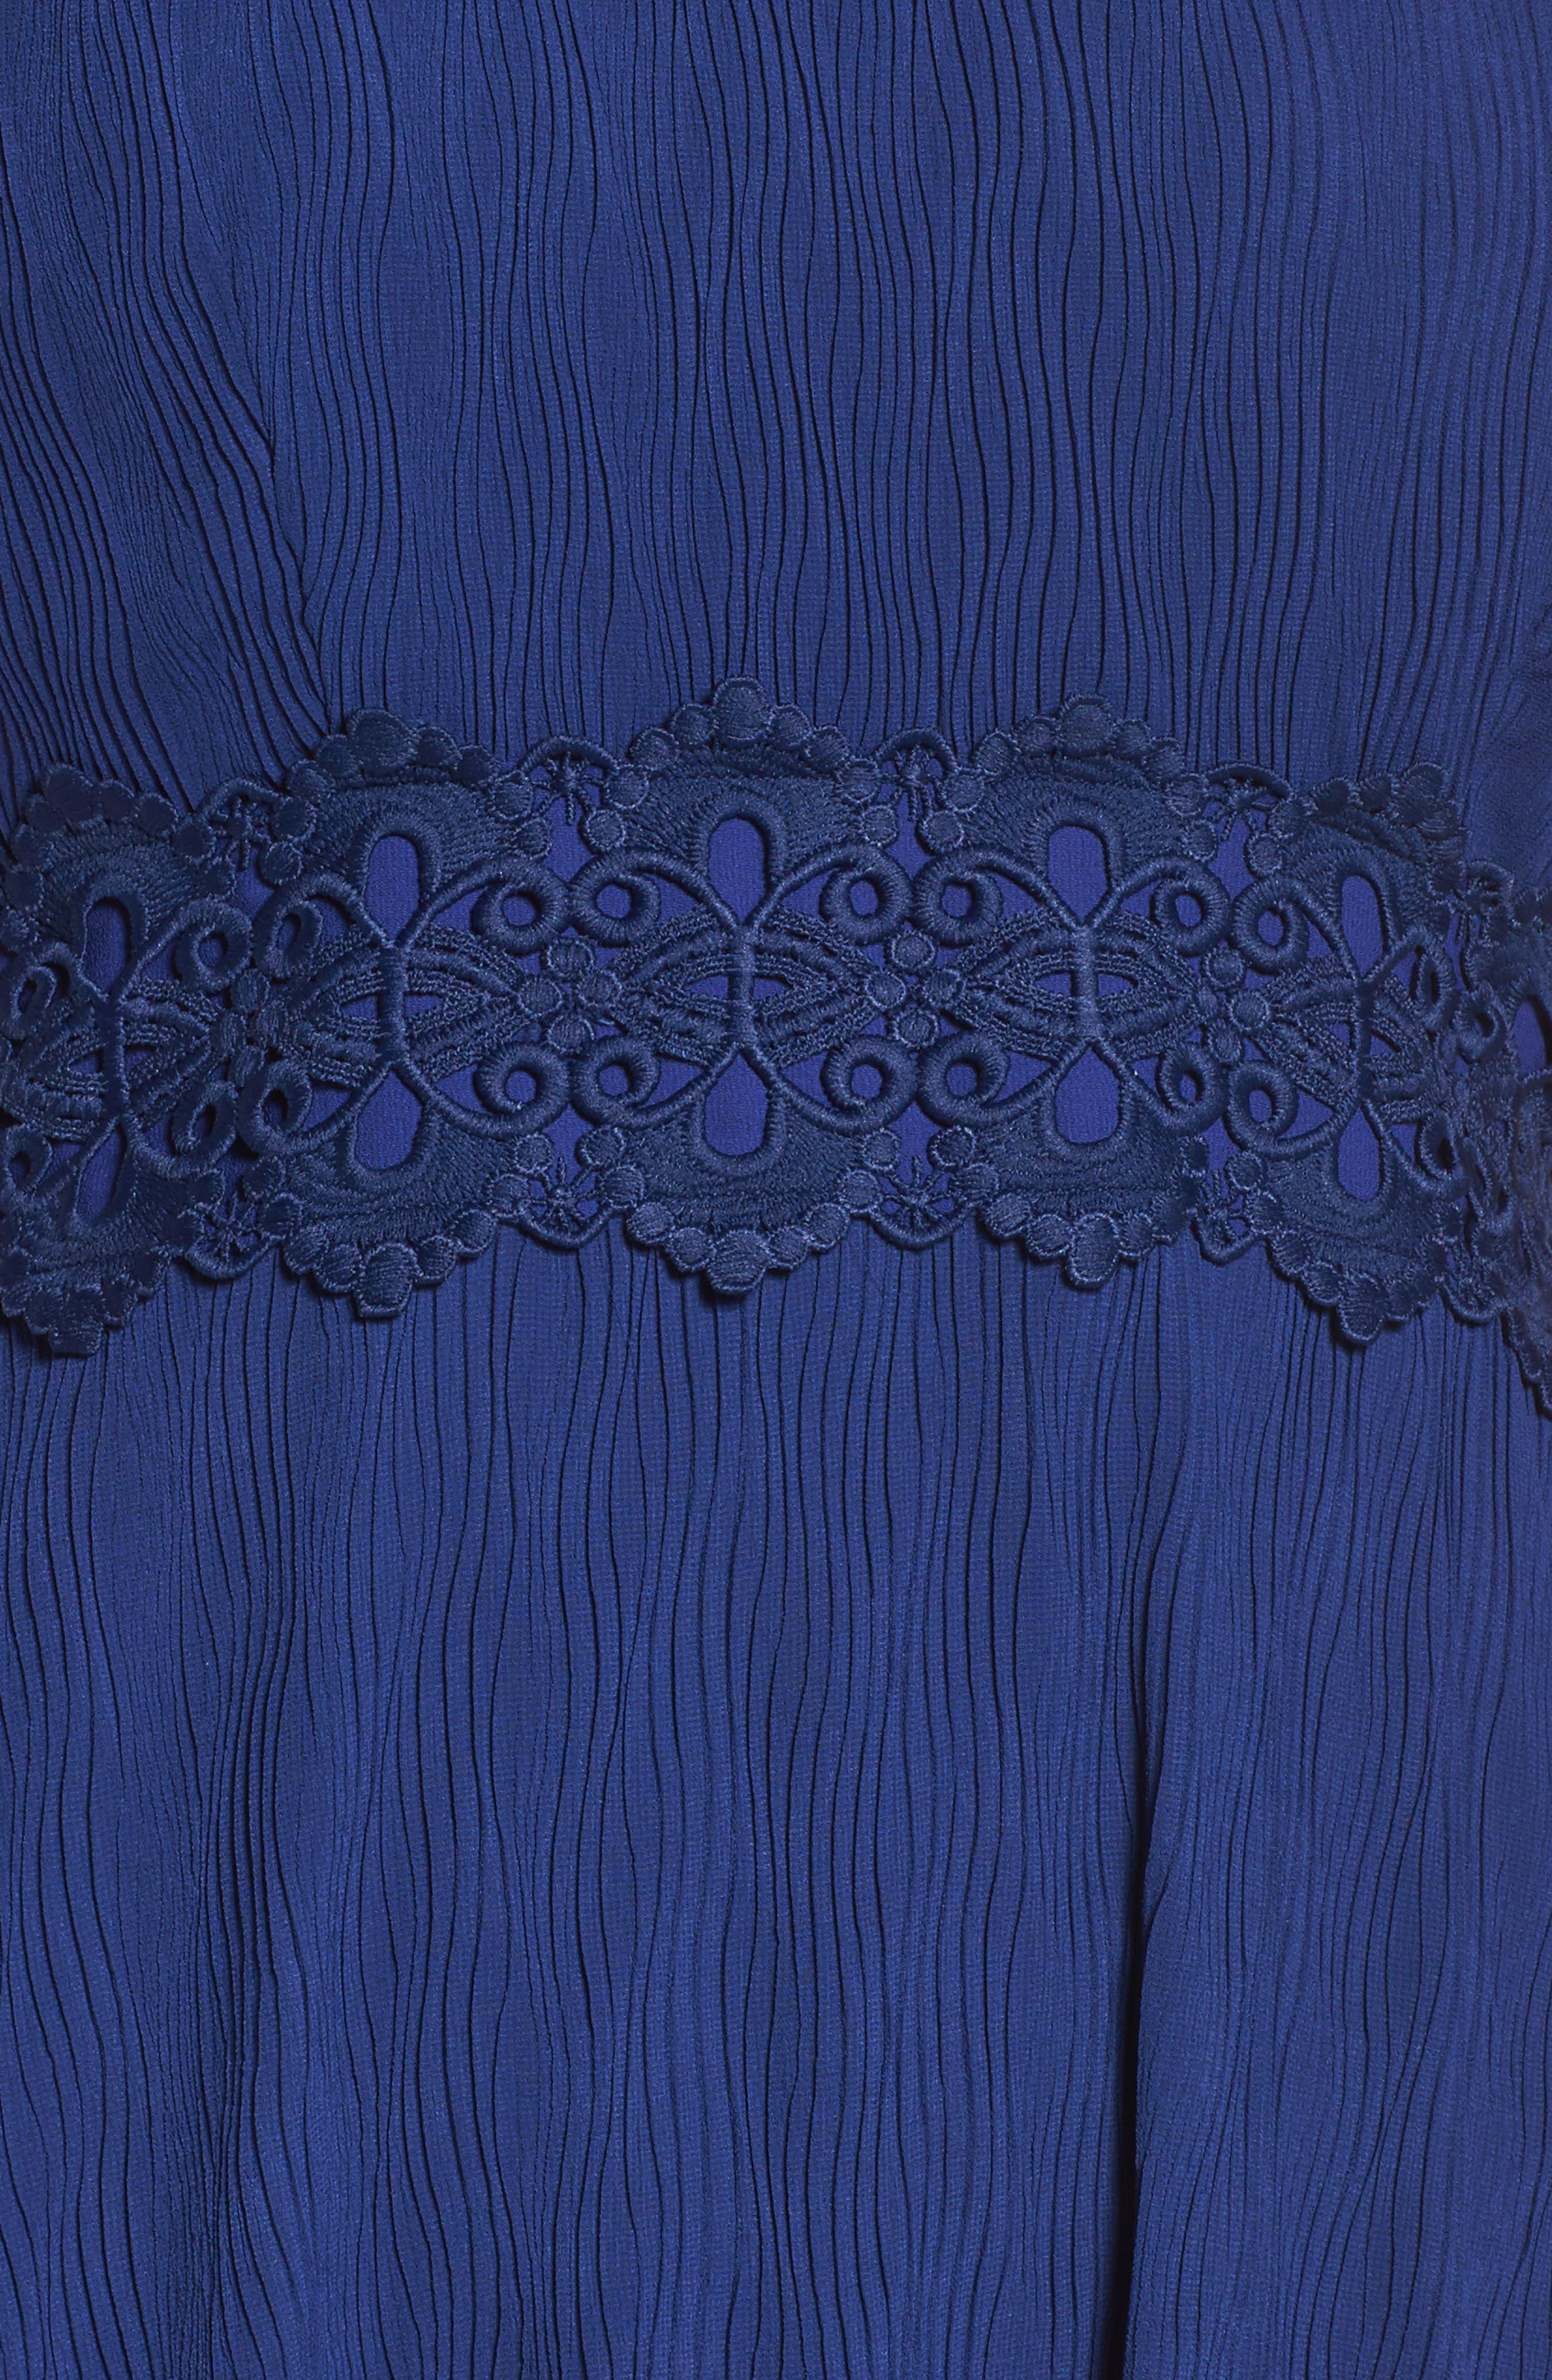 Isadora Lace Trim Pintuck Midi Dress,                             Alternate thumbnail 5, color,